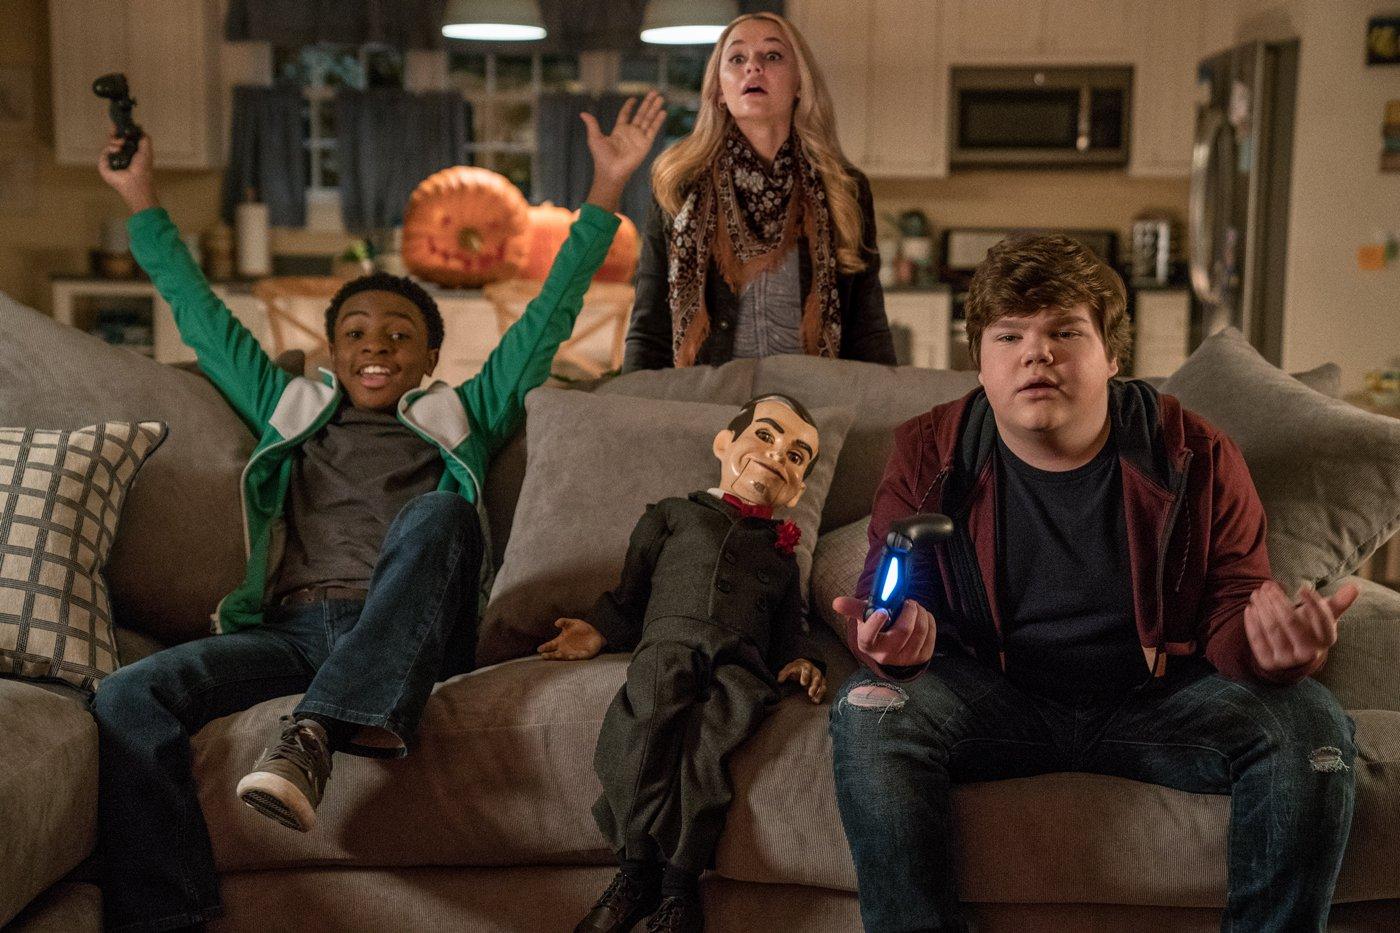 Goosebumps 2 Haunted Halloween 2020 Review Goosebumps 2: Haunted Halloween' Review: Family Friendly Sequel